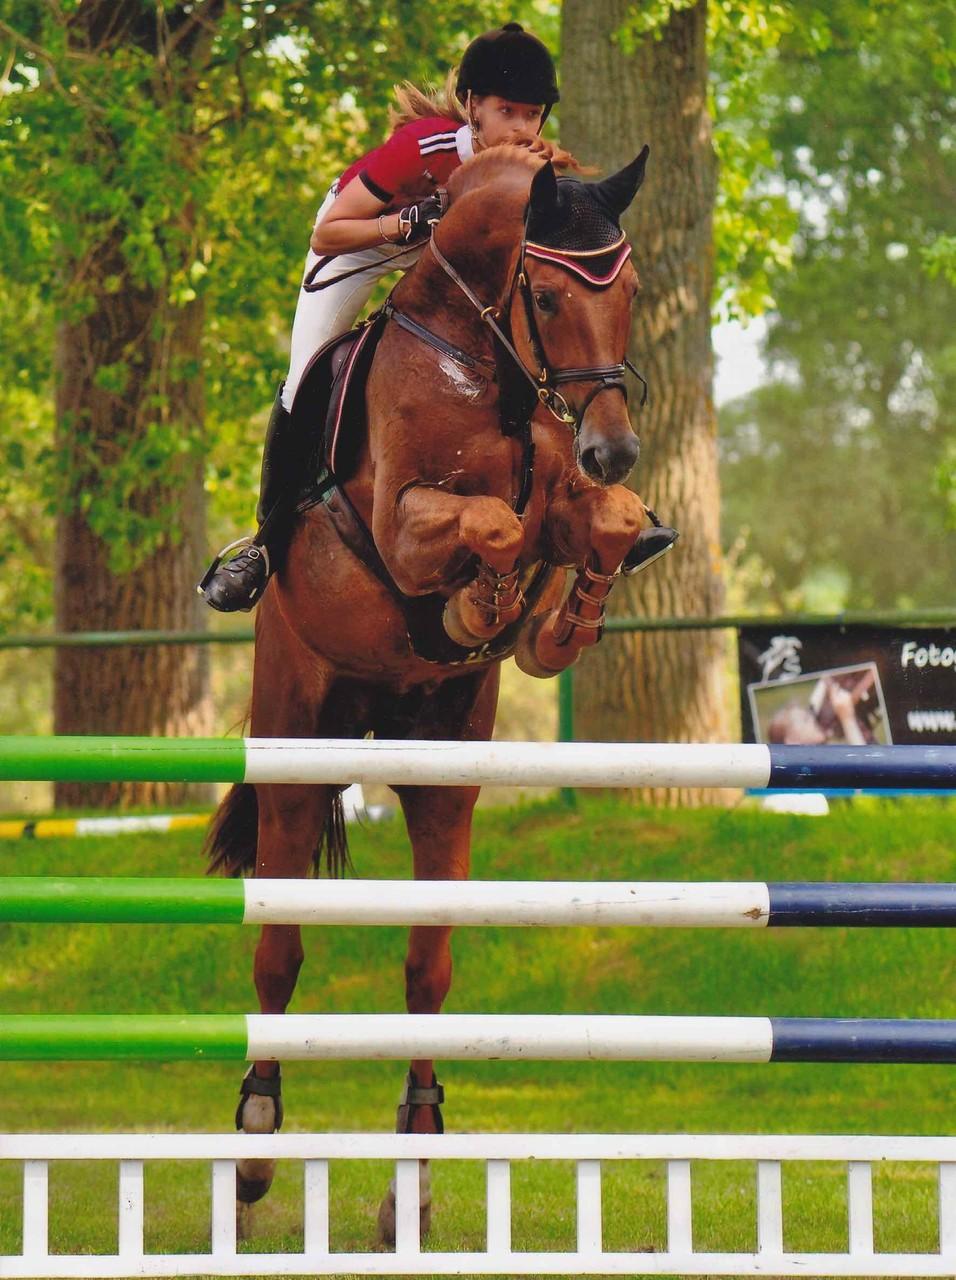 Mounted by Nora Tranins